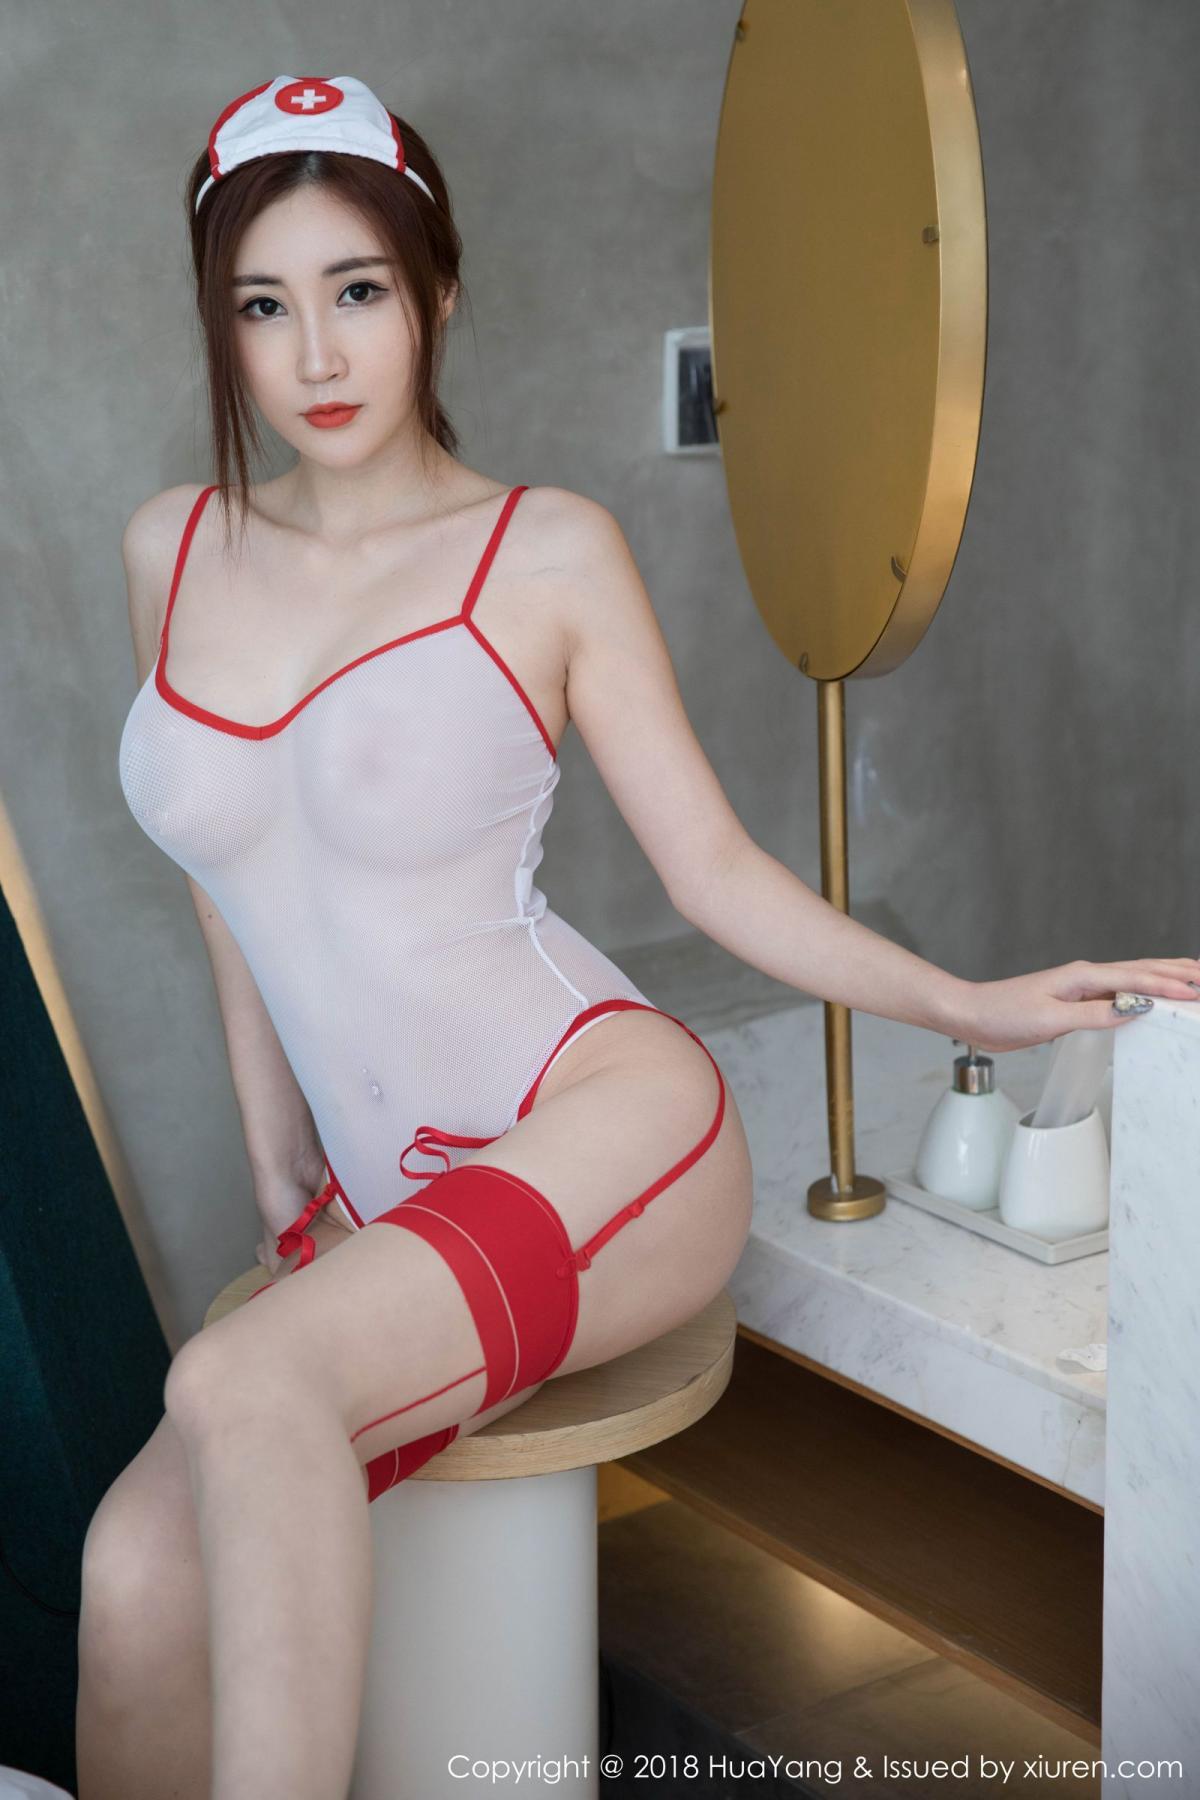 [Huayang] Vol.092 Sun Meng Yao 1P, HuaYang, Nurse, Sun Meng Yao, Tall, Uniform